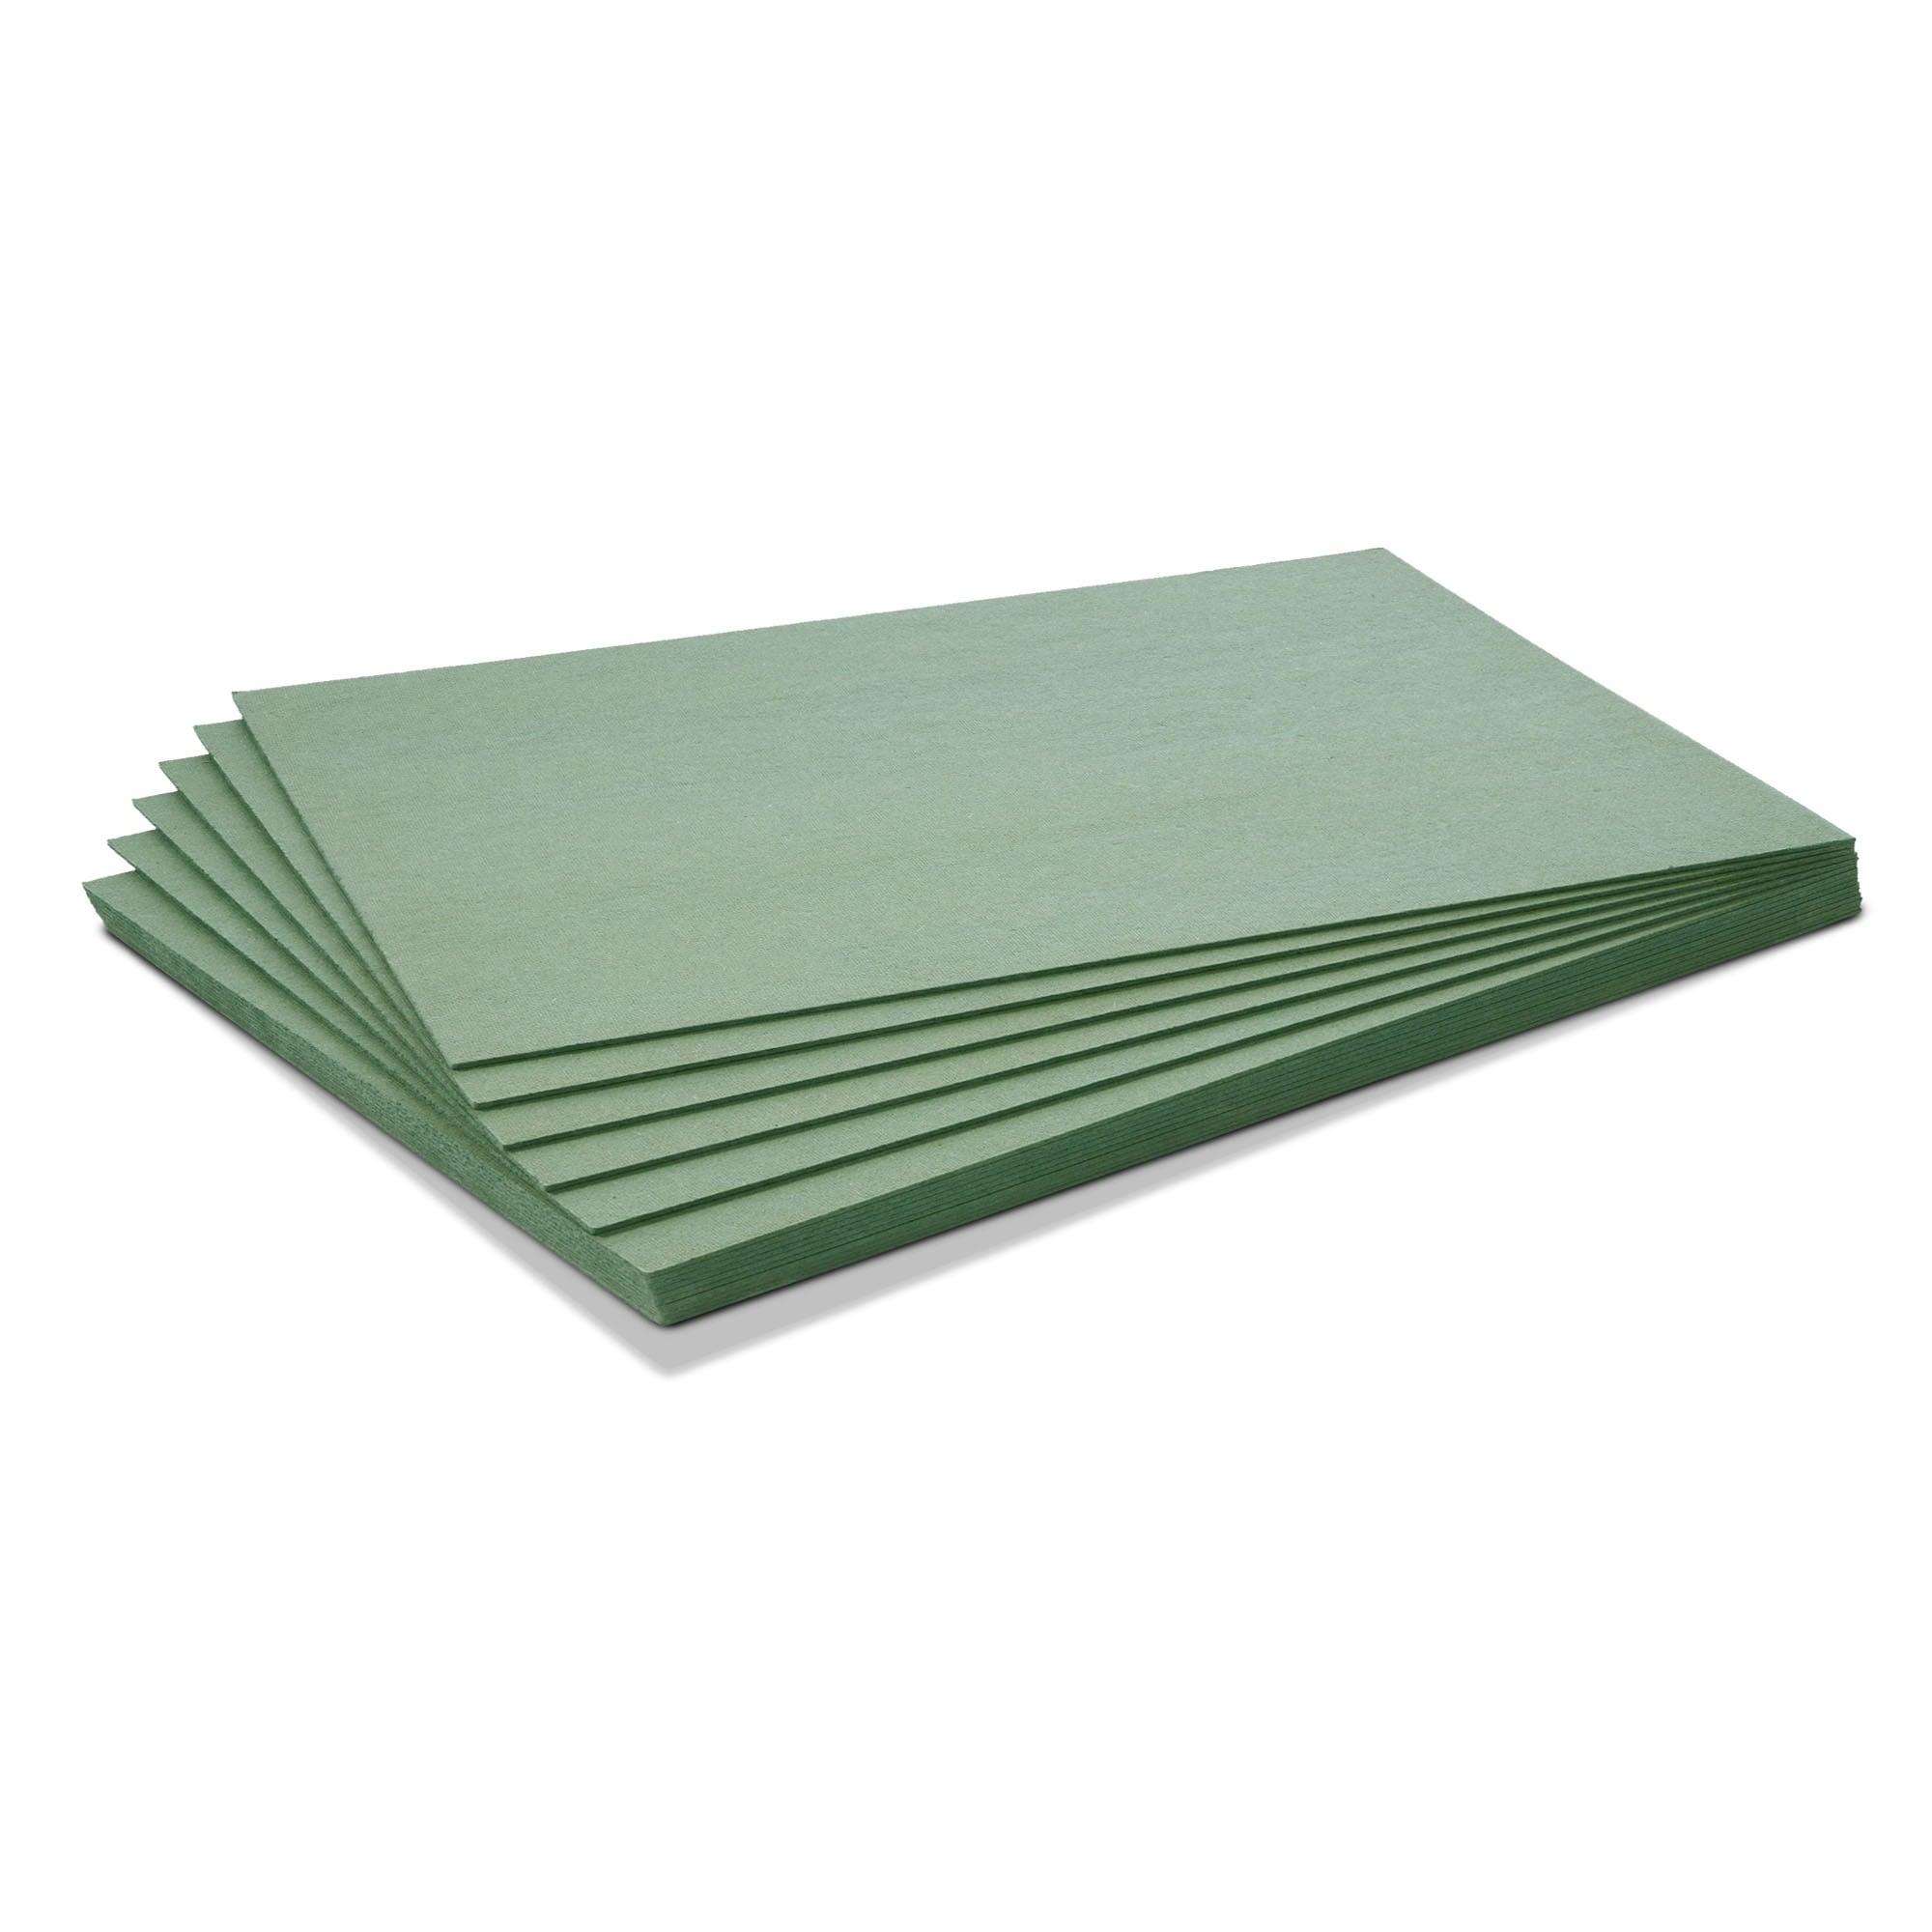 Wood plus silent sound 5mm foam flooring underlay for 6mm wood floor underlay